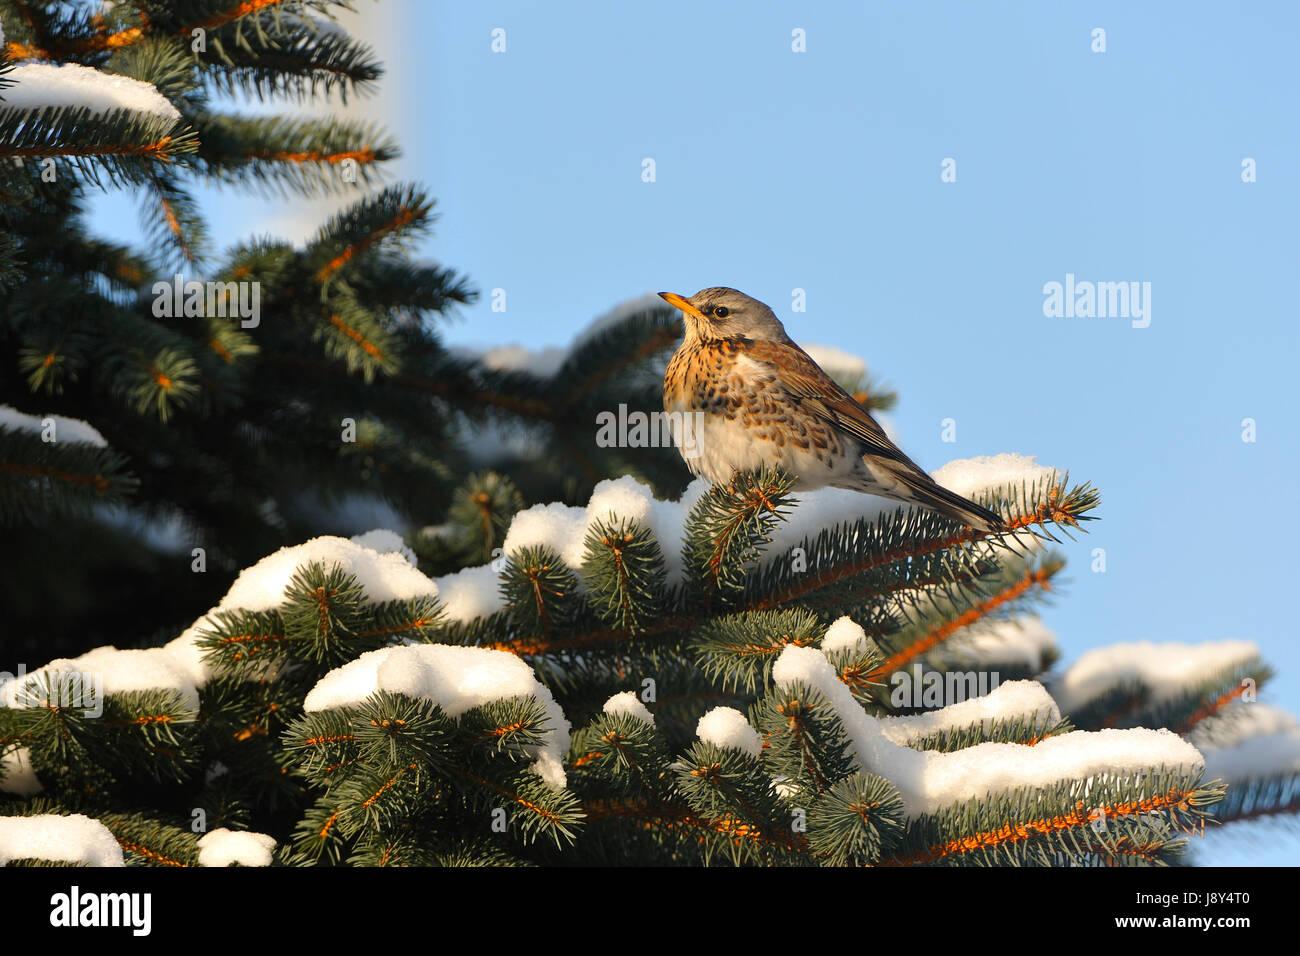 winter, bird, cold, birds, thrush, winter, animal, bird, cold, birds, Stock Photo